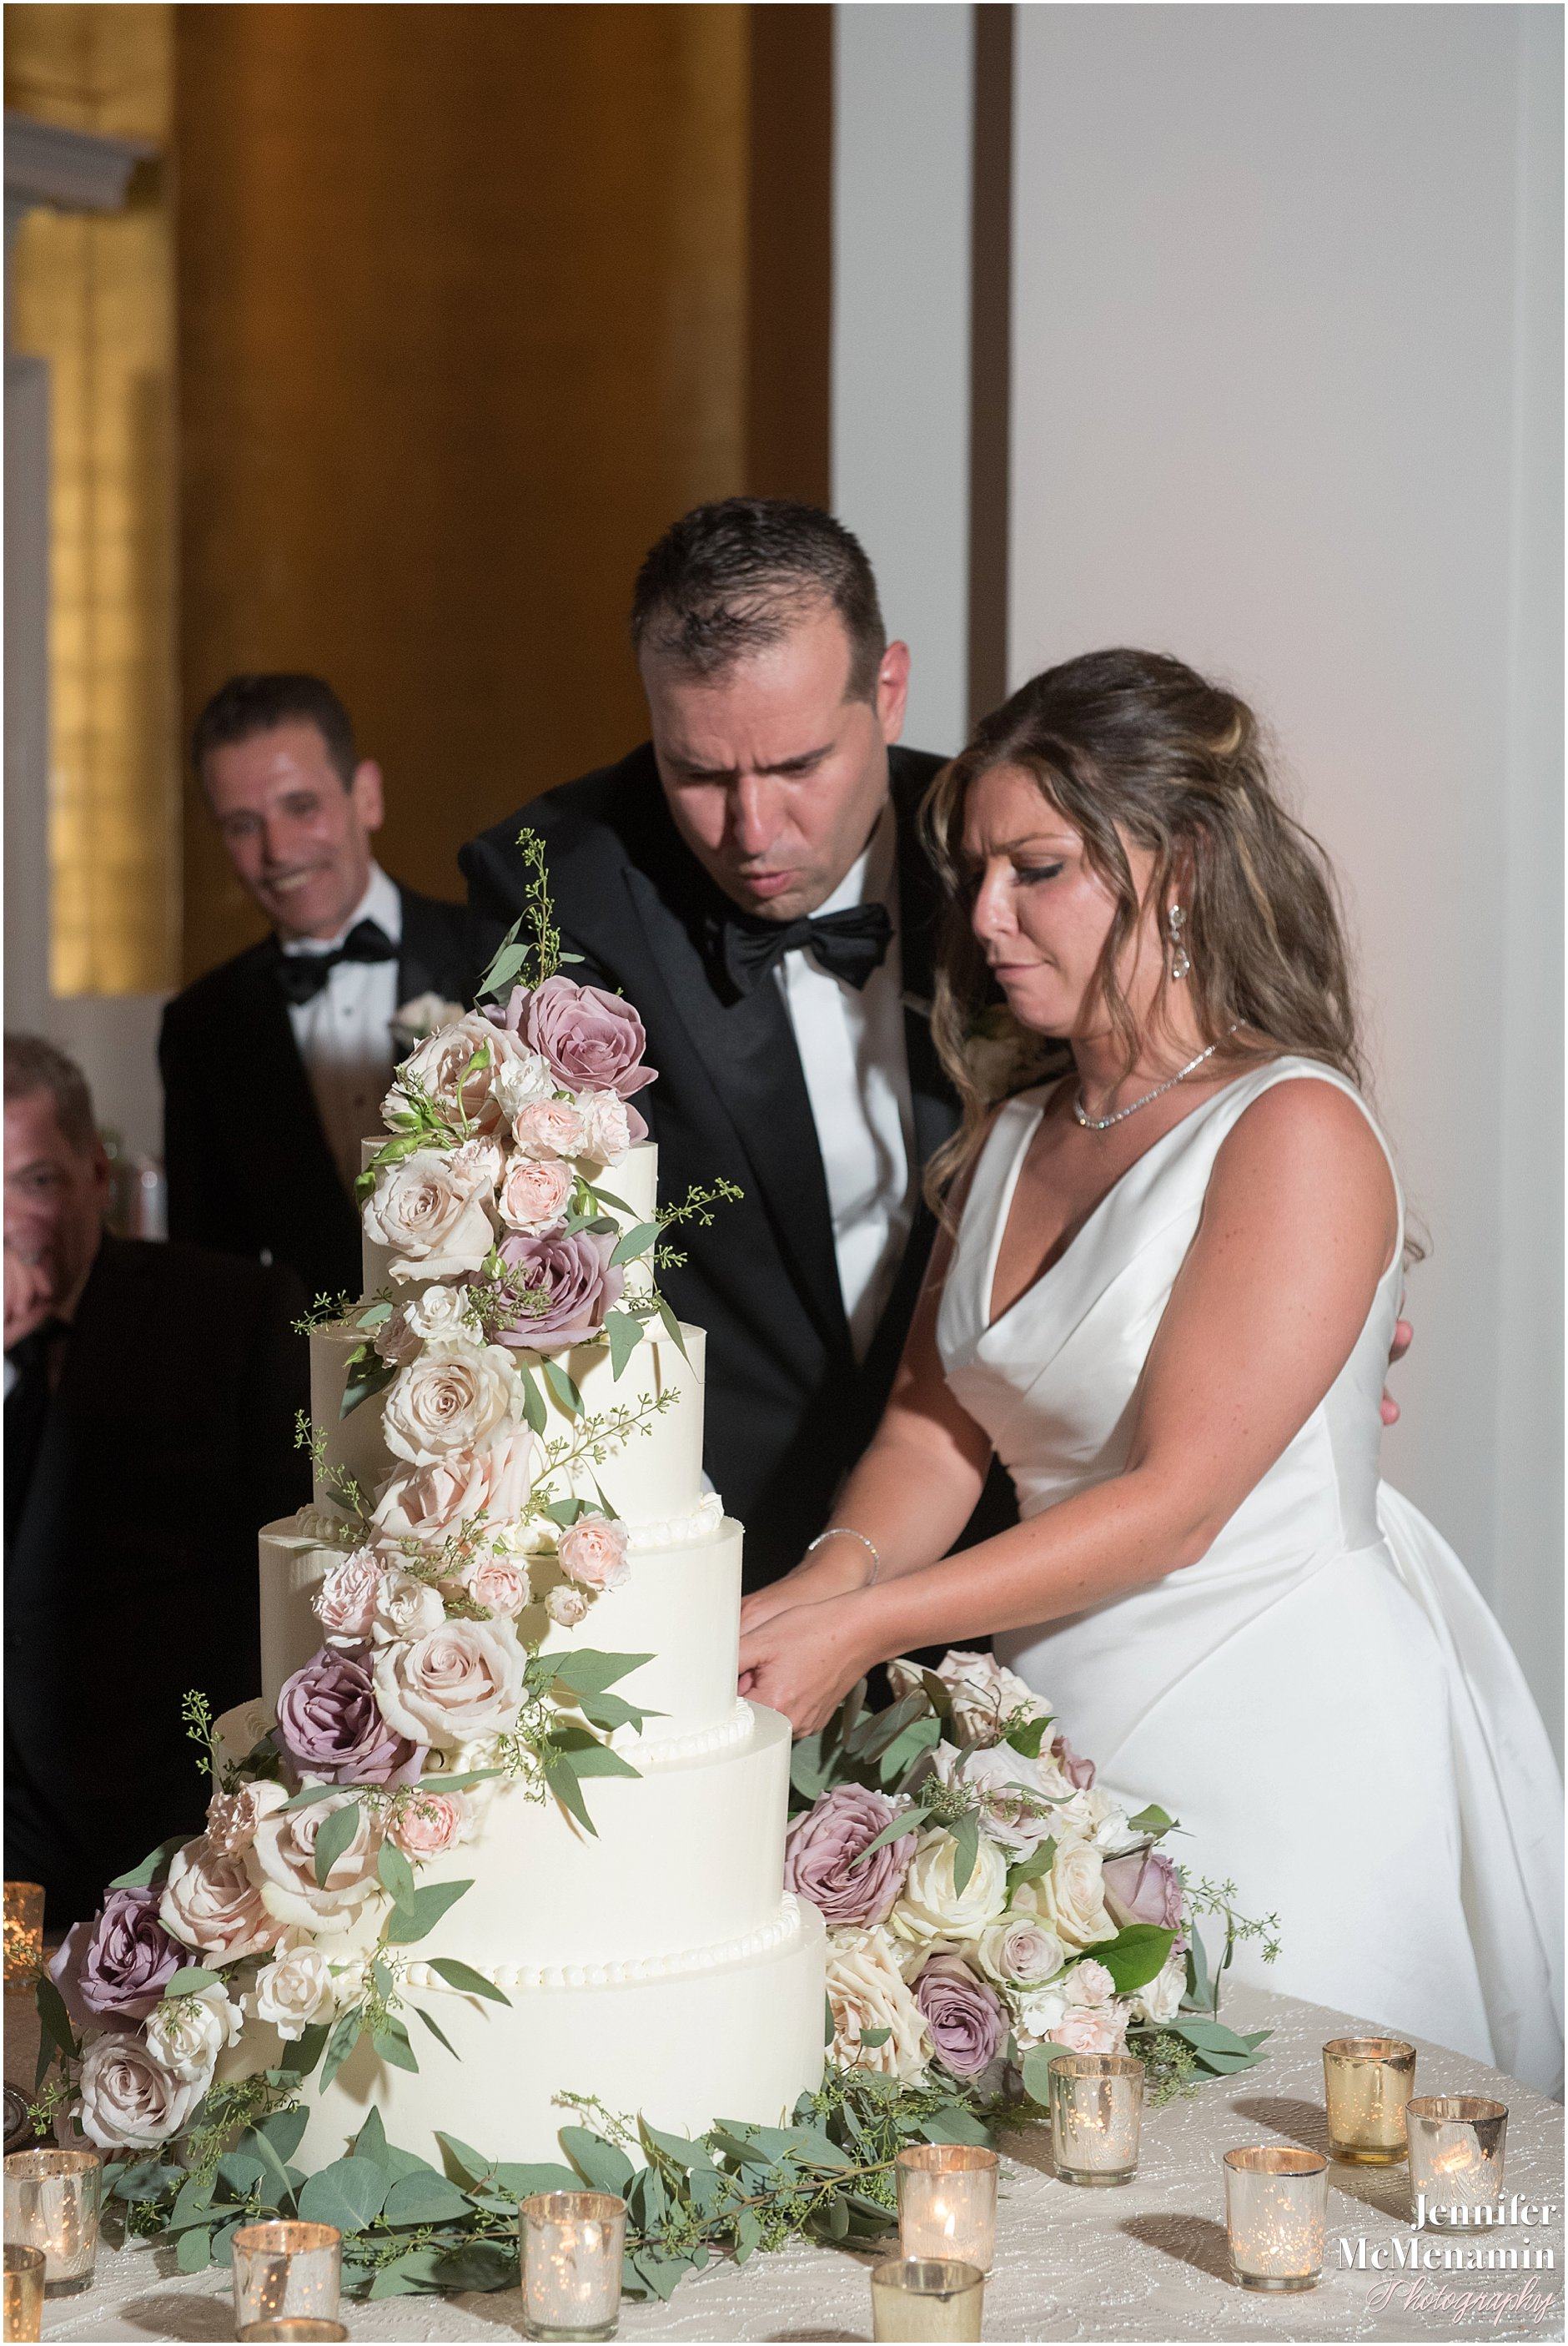 Jennifer-McMenamin-Photography-Sagamore-Pendry-wedding_1795.jpg